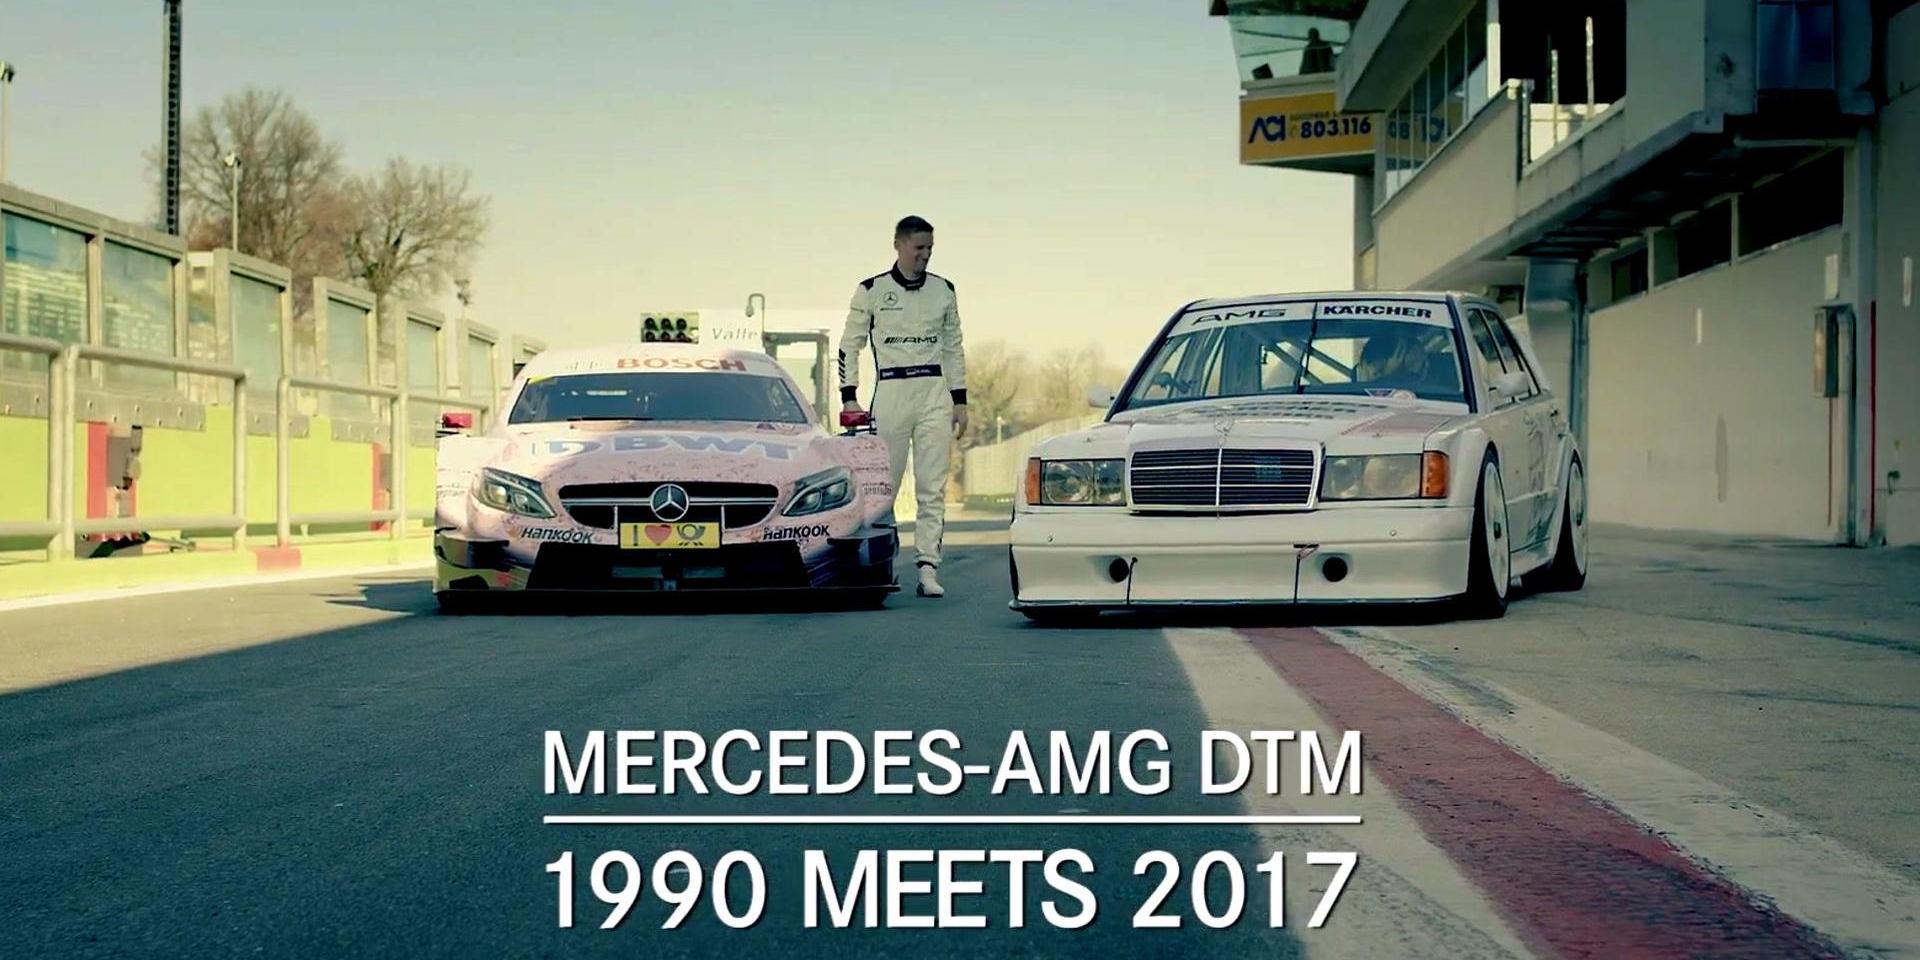 Mercedes-Benz新舊DTM賽車大對決,190E對上C63你怎麼選?